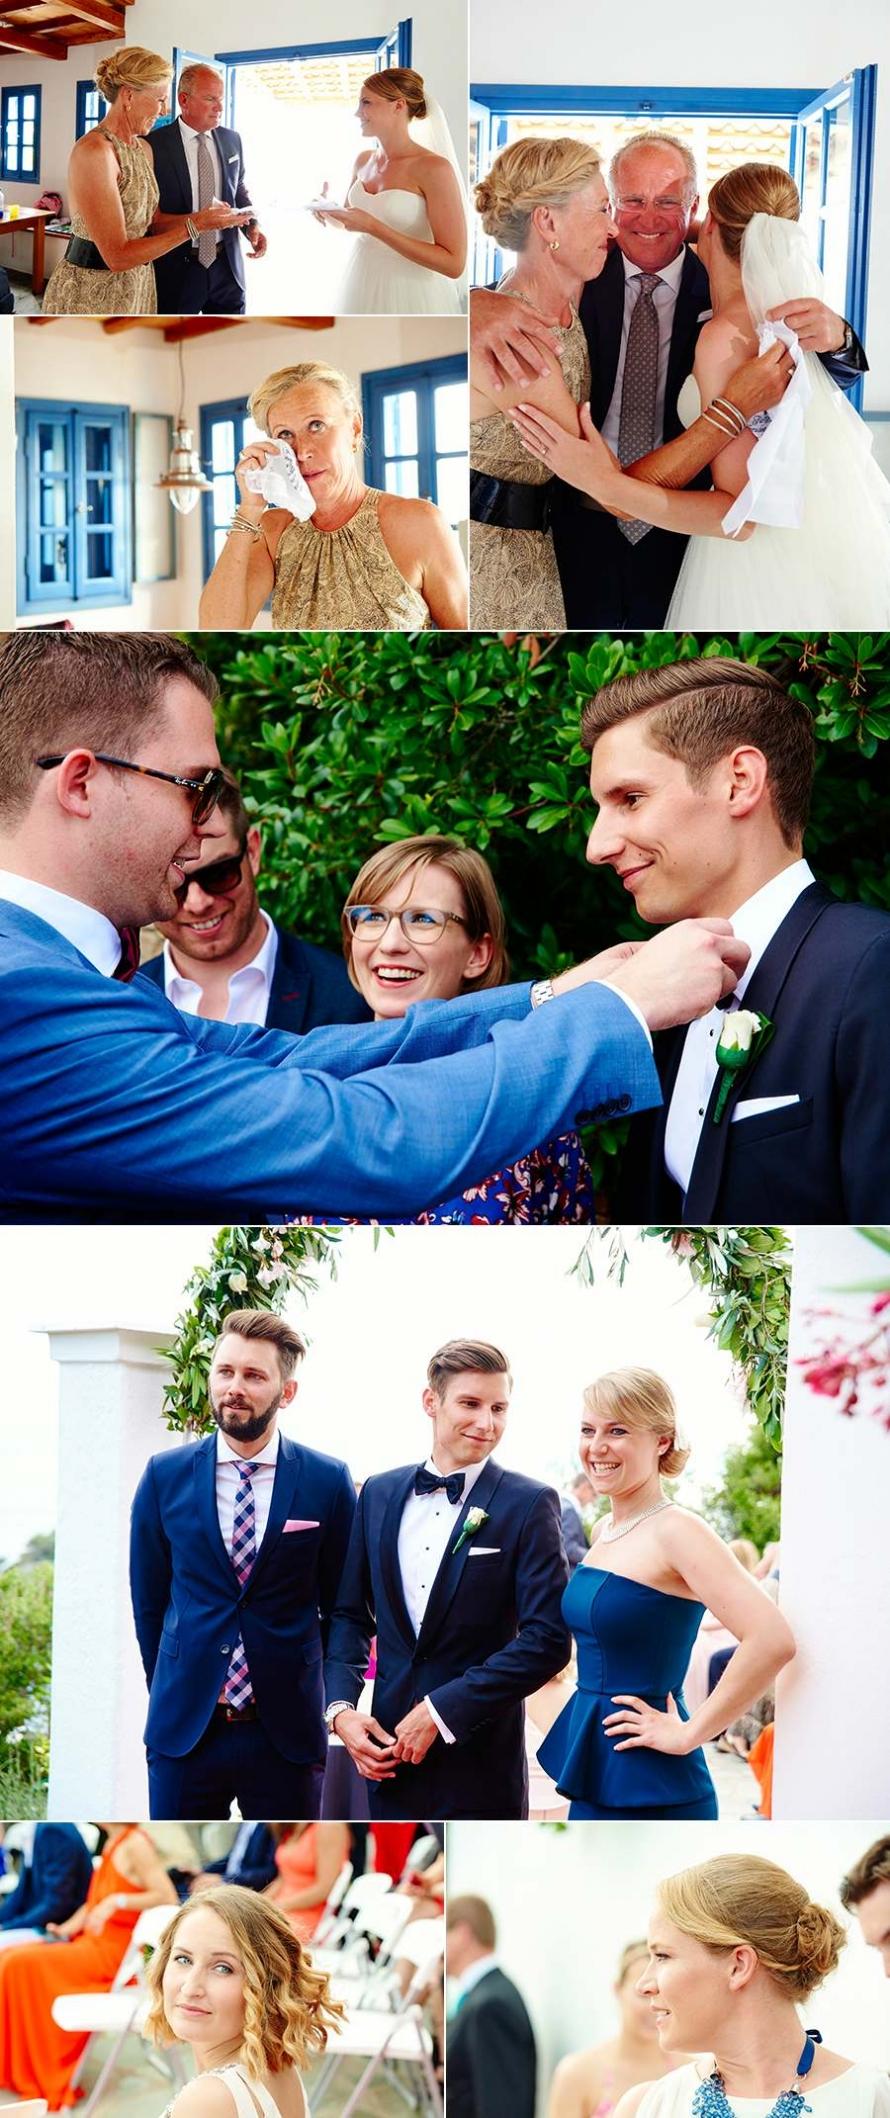 Tobi & Vanessa wedding photos 11